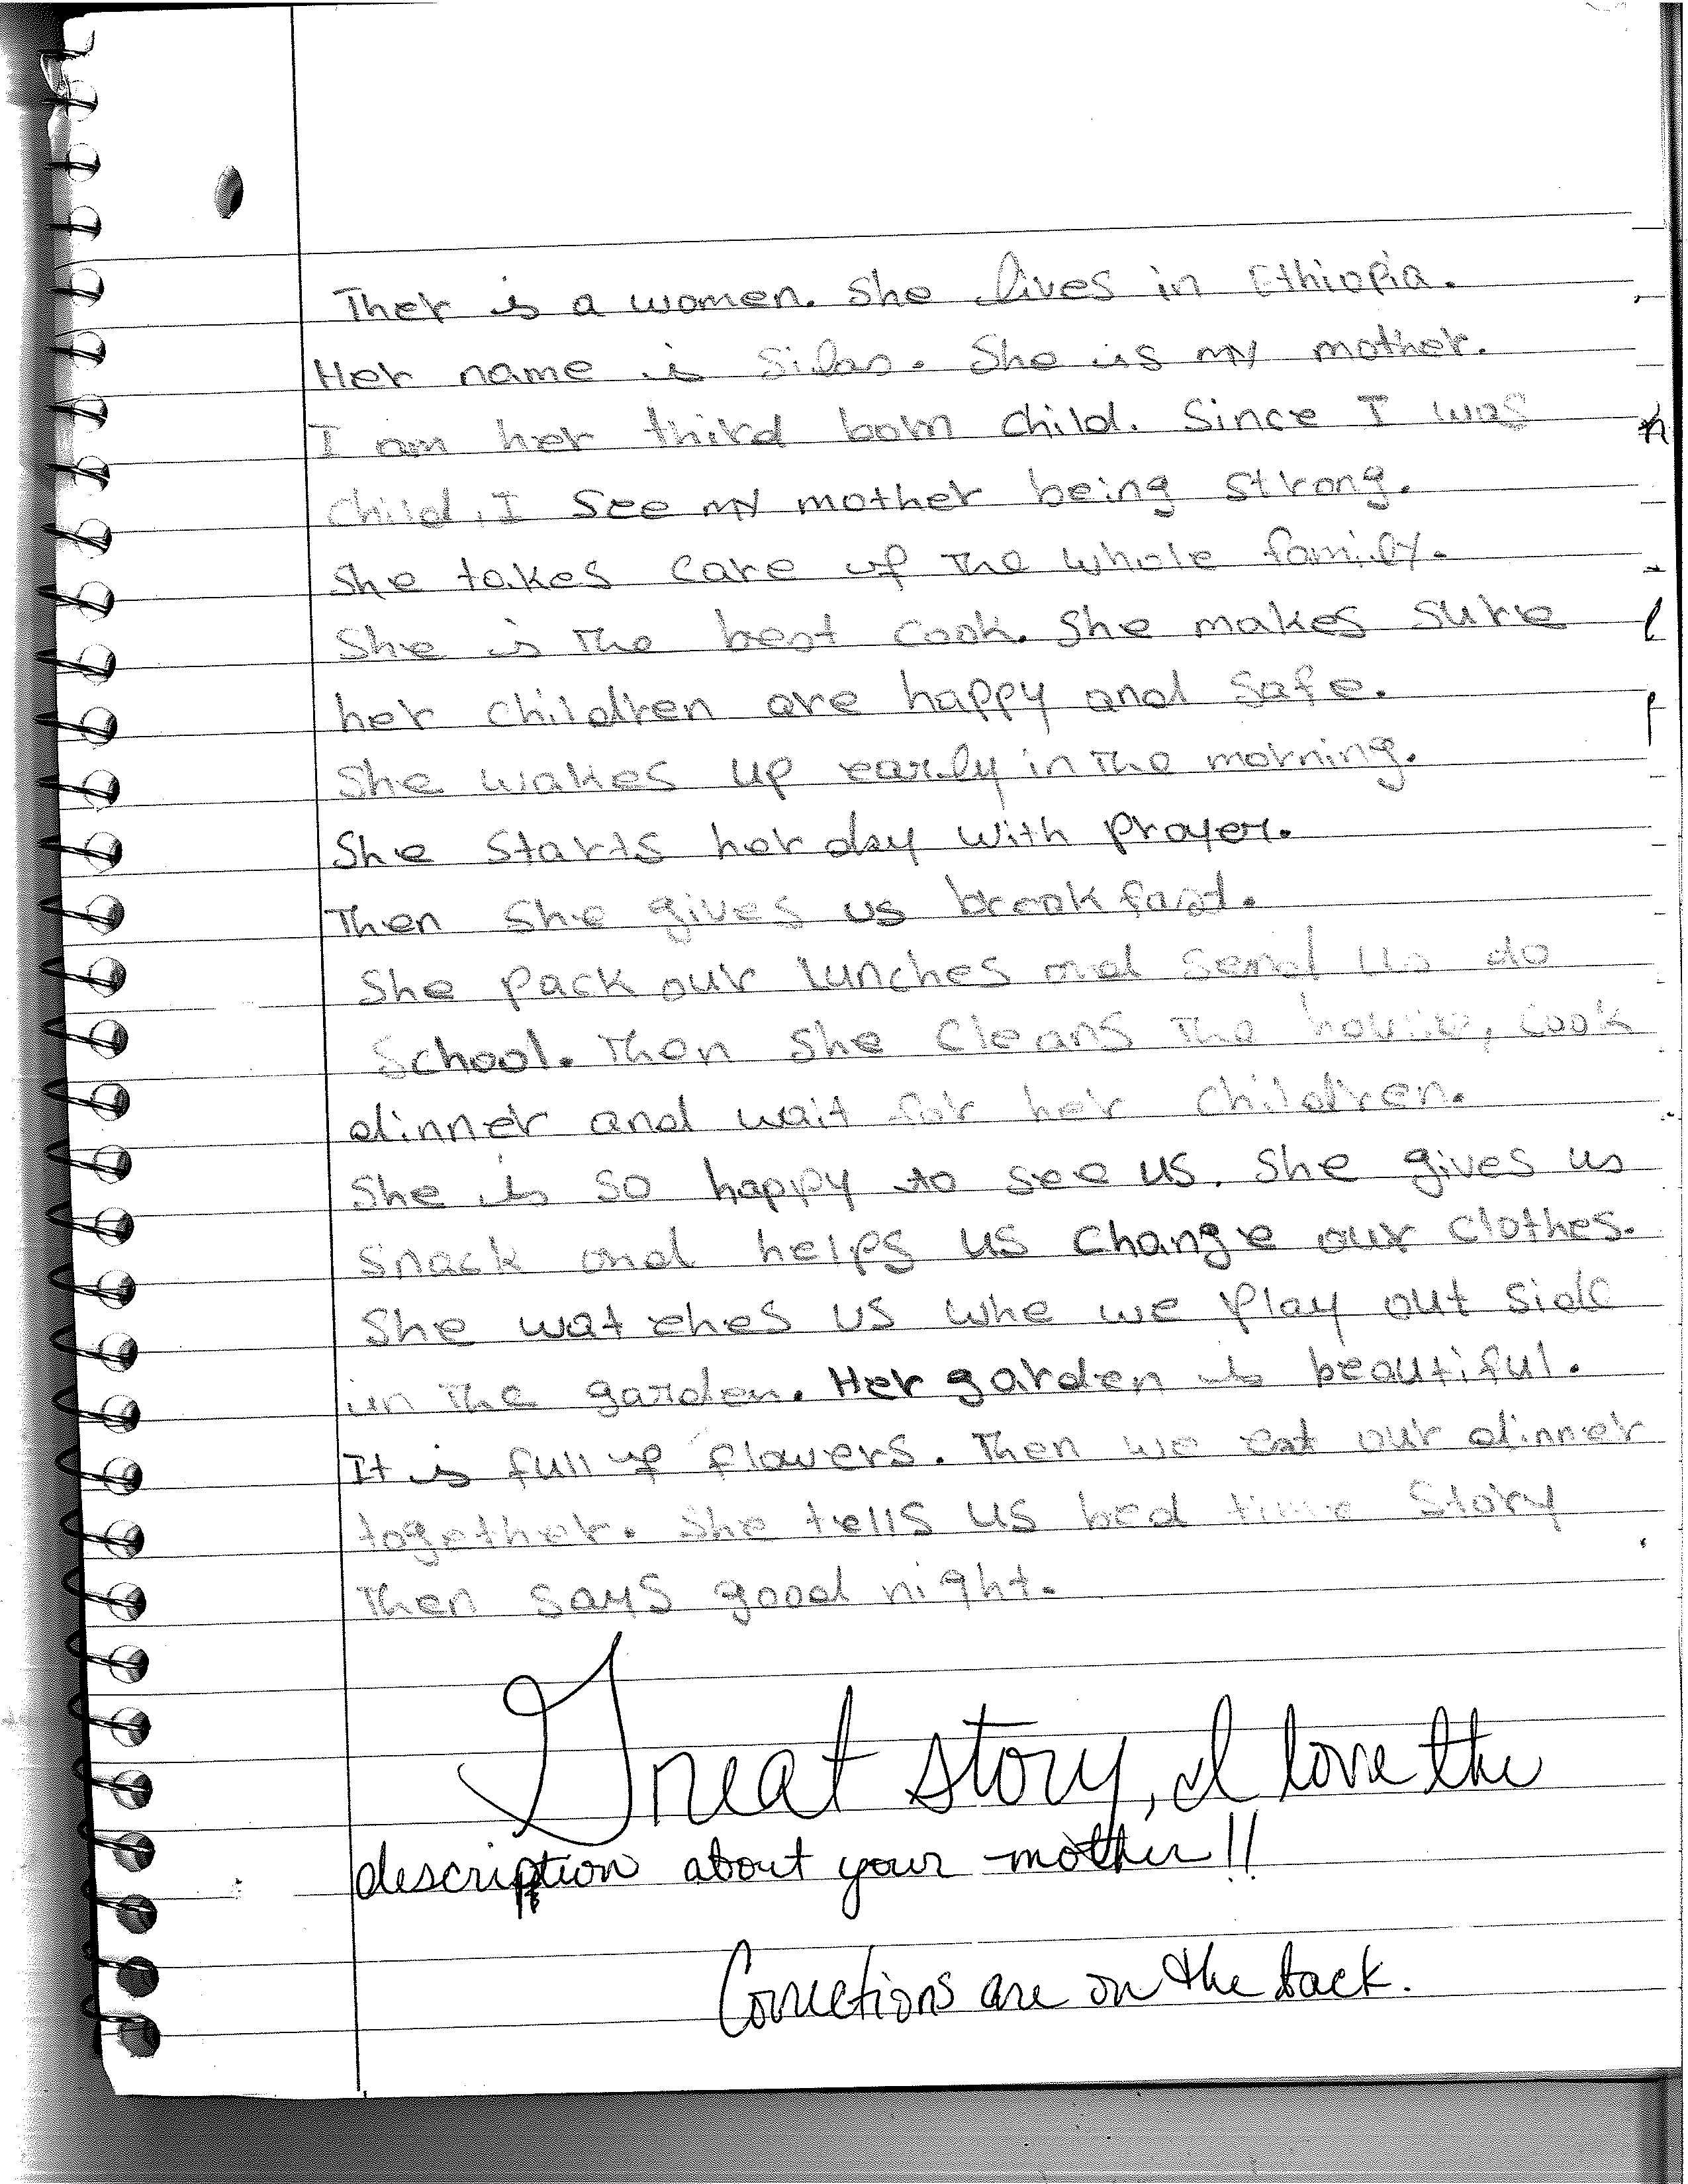 Persuasive Essay On Organ Donation Student Council Essay Ideas Lok Lehrte Qualities Of A Great Leader Essay also Essays On Medicine Student Council Essay Examples  Essays Essay On Confucianism